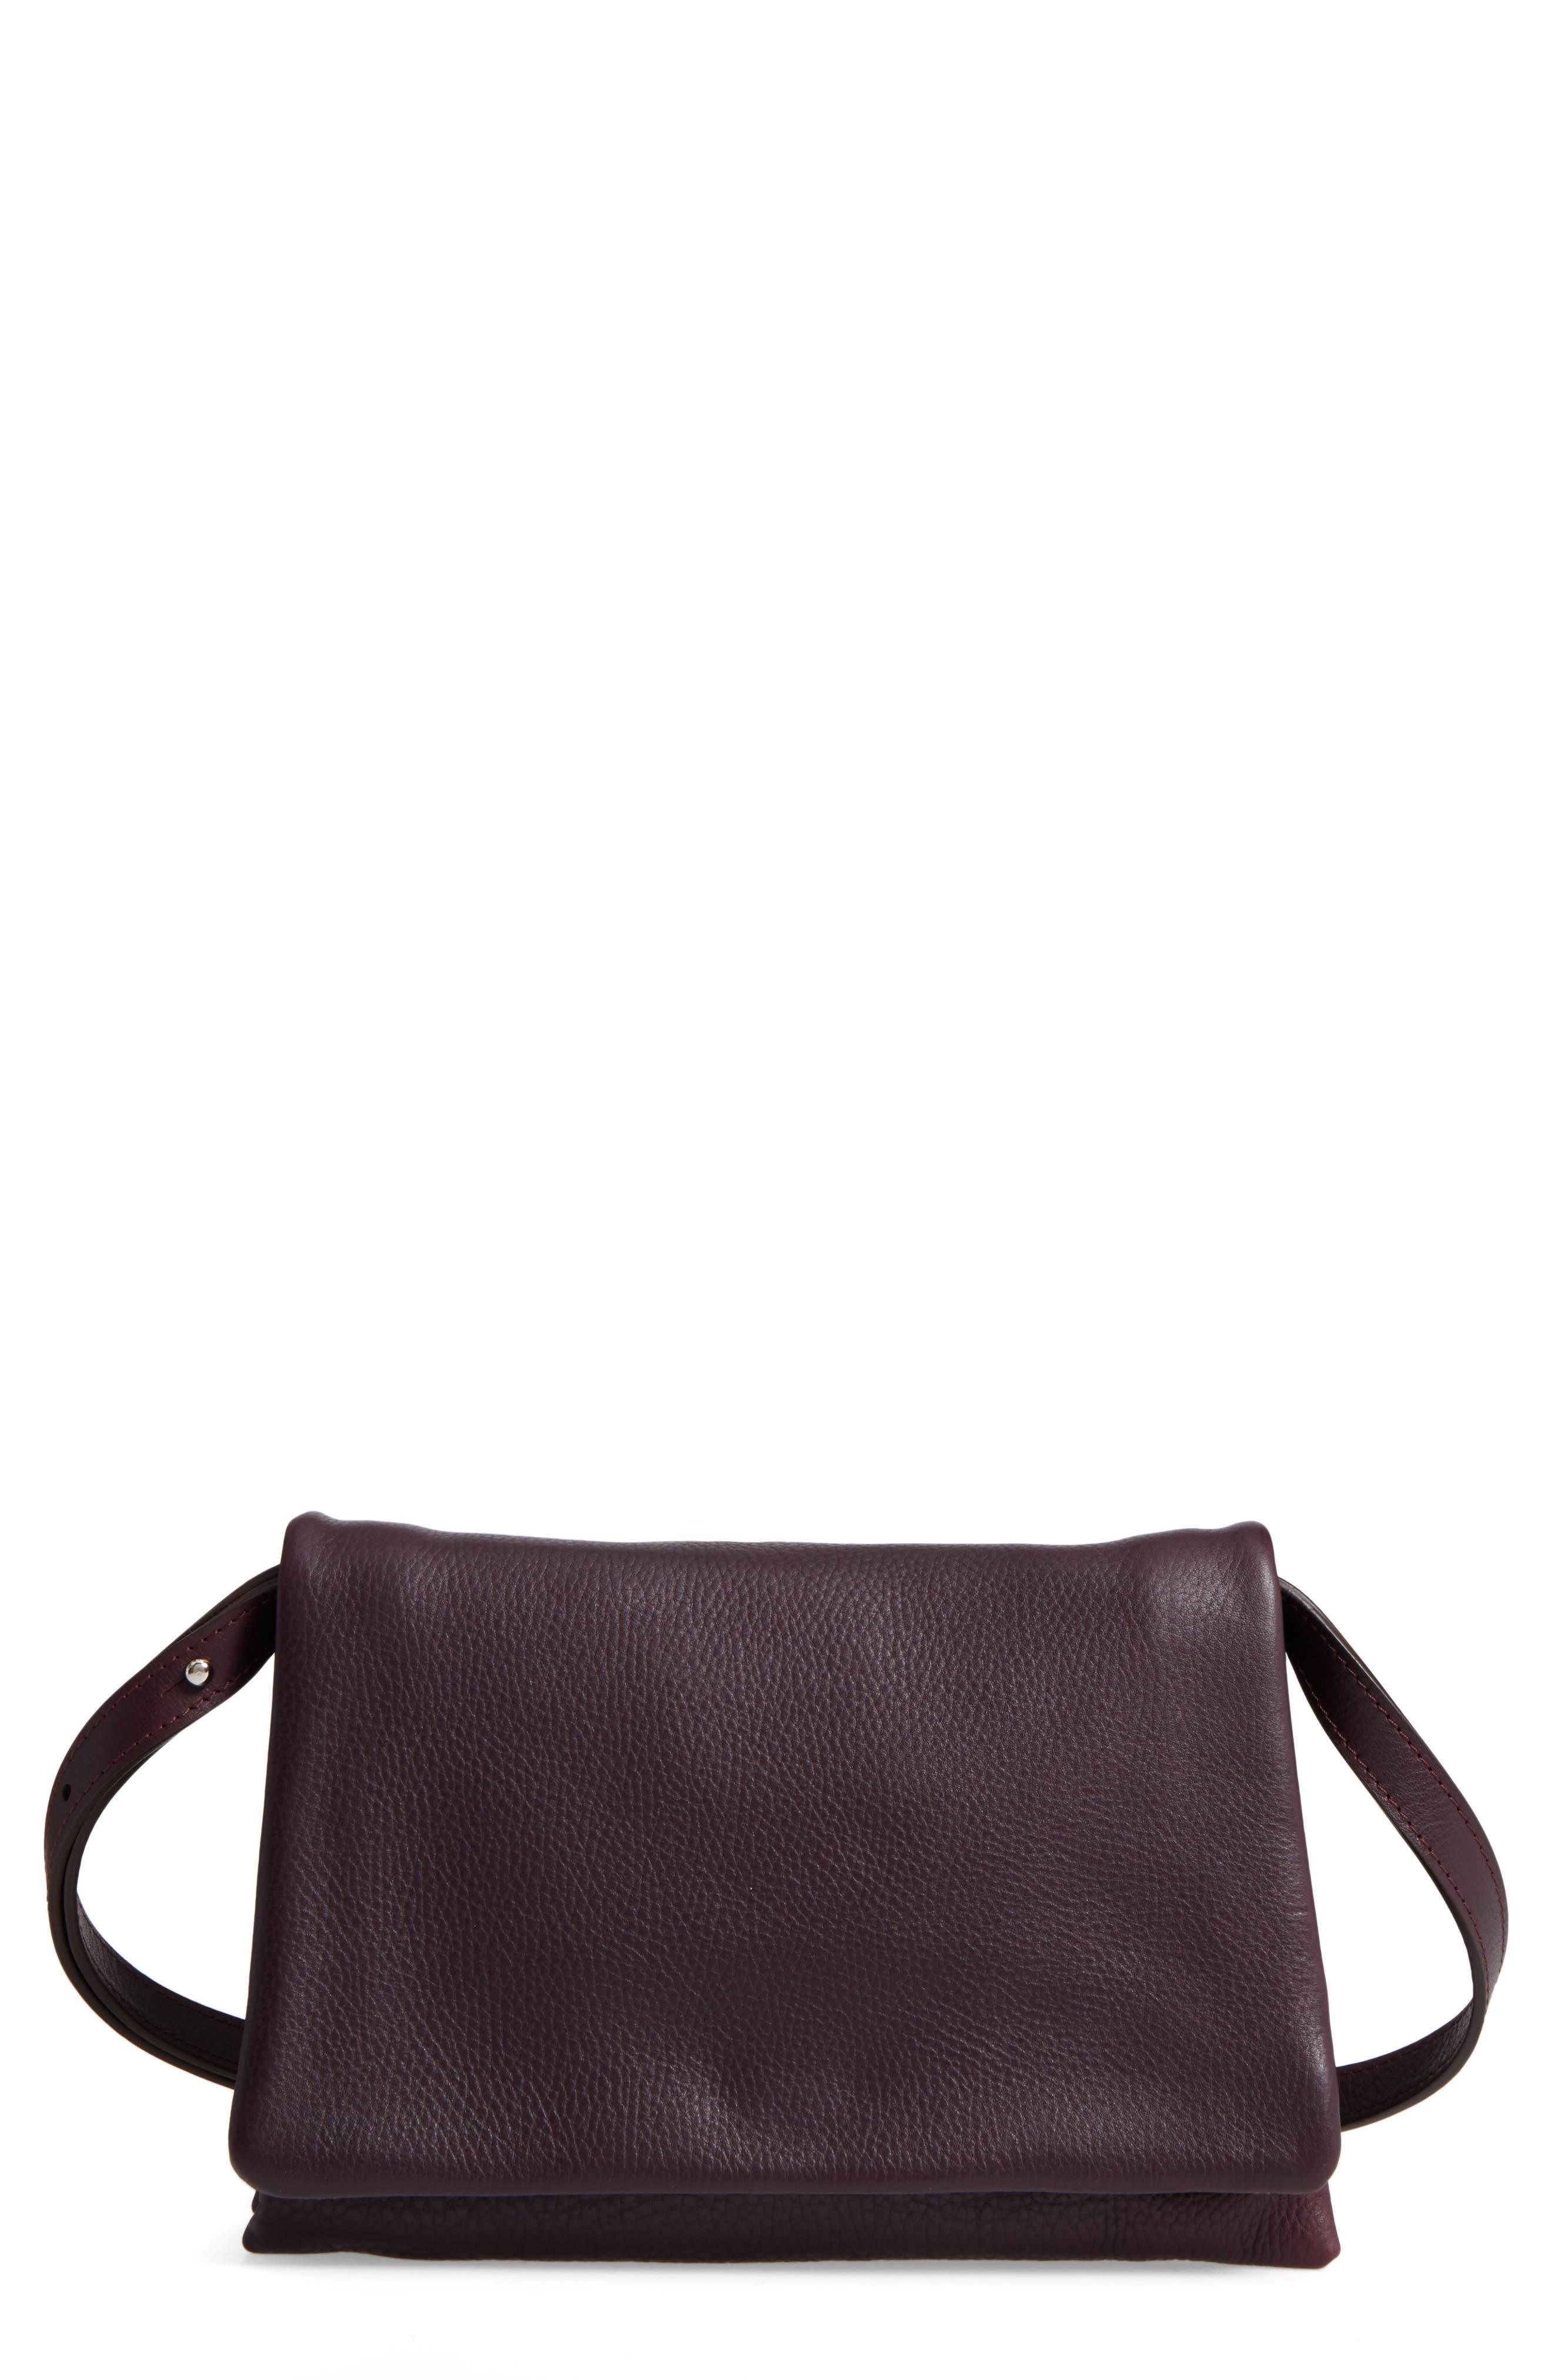 Shinola Leather Convertible Shoulder Bag